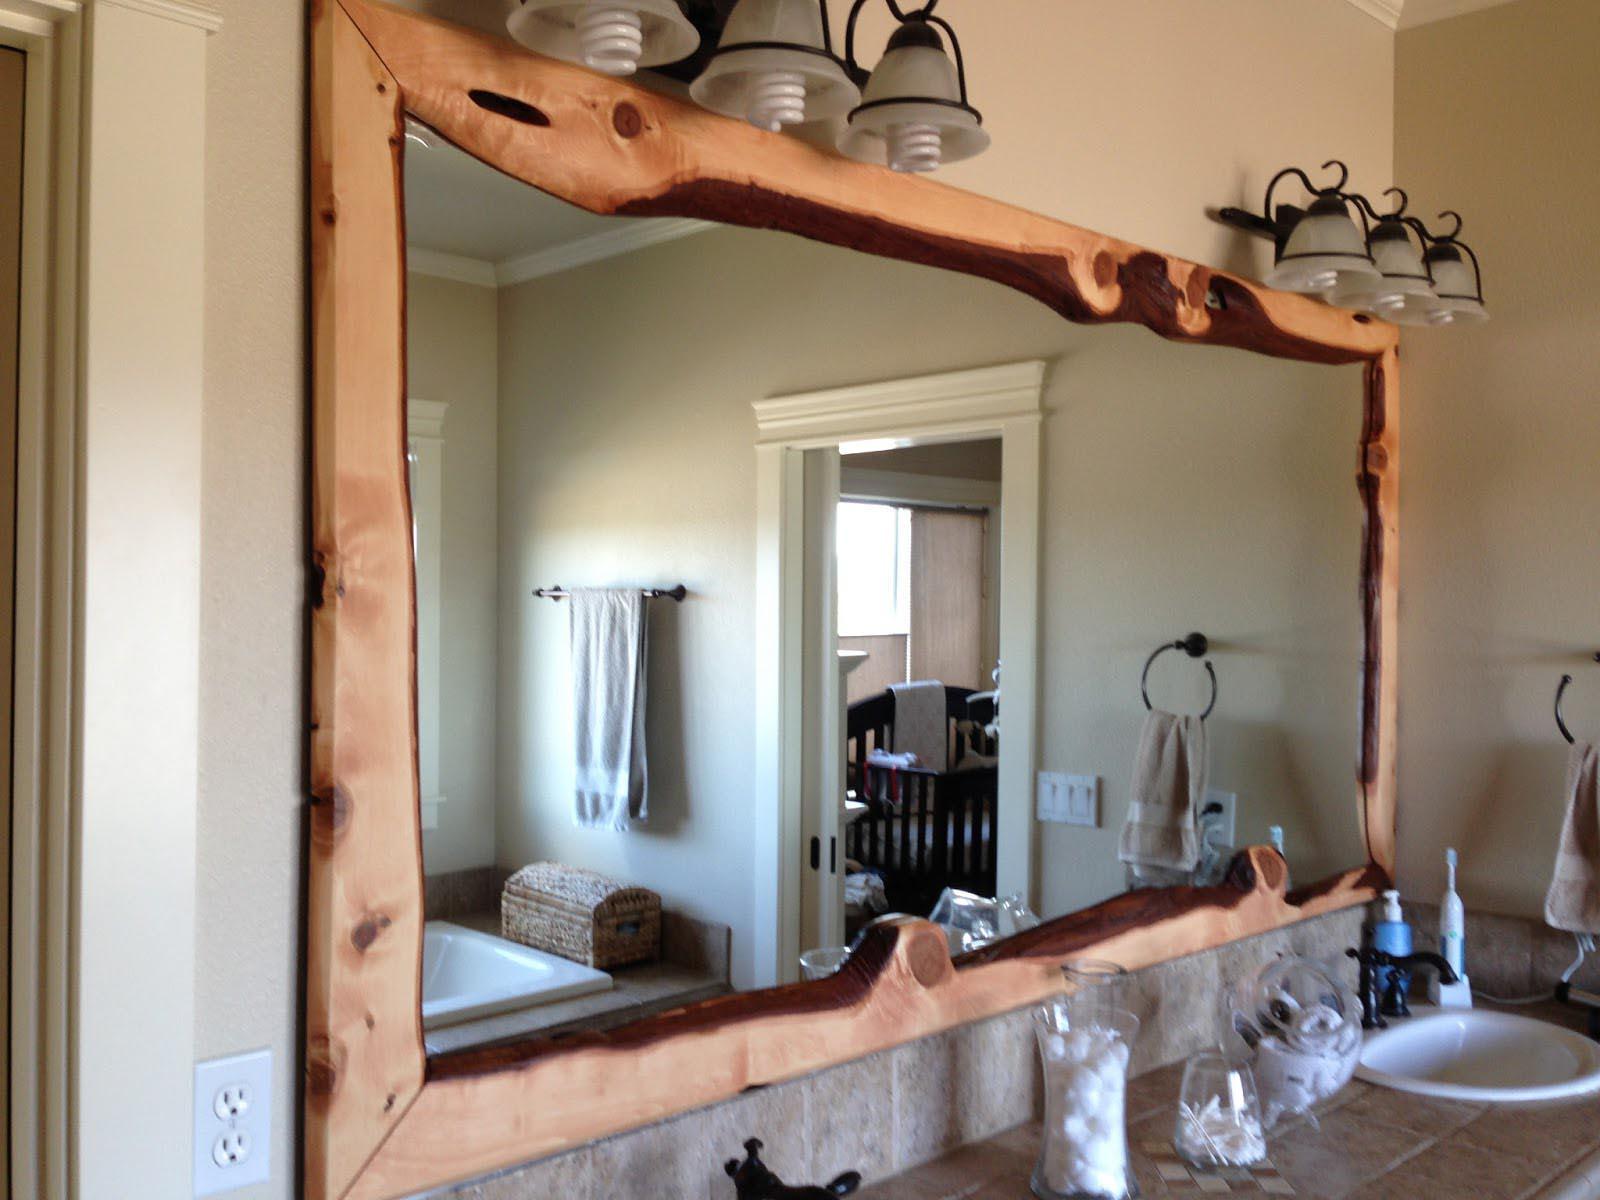 Wood Framed Bathroom Mirrors  Best Decor Things